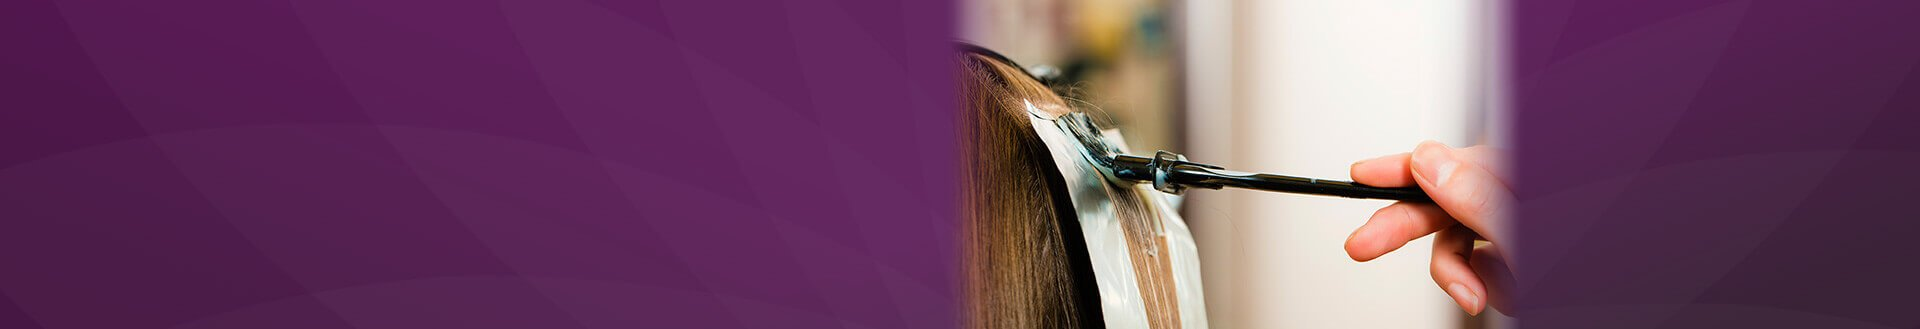 Haarausfall durch falsche Pflege?